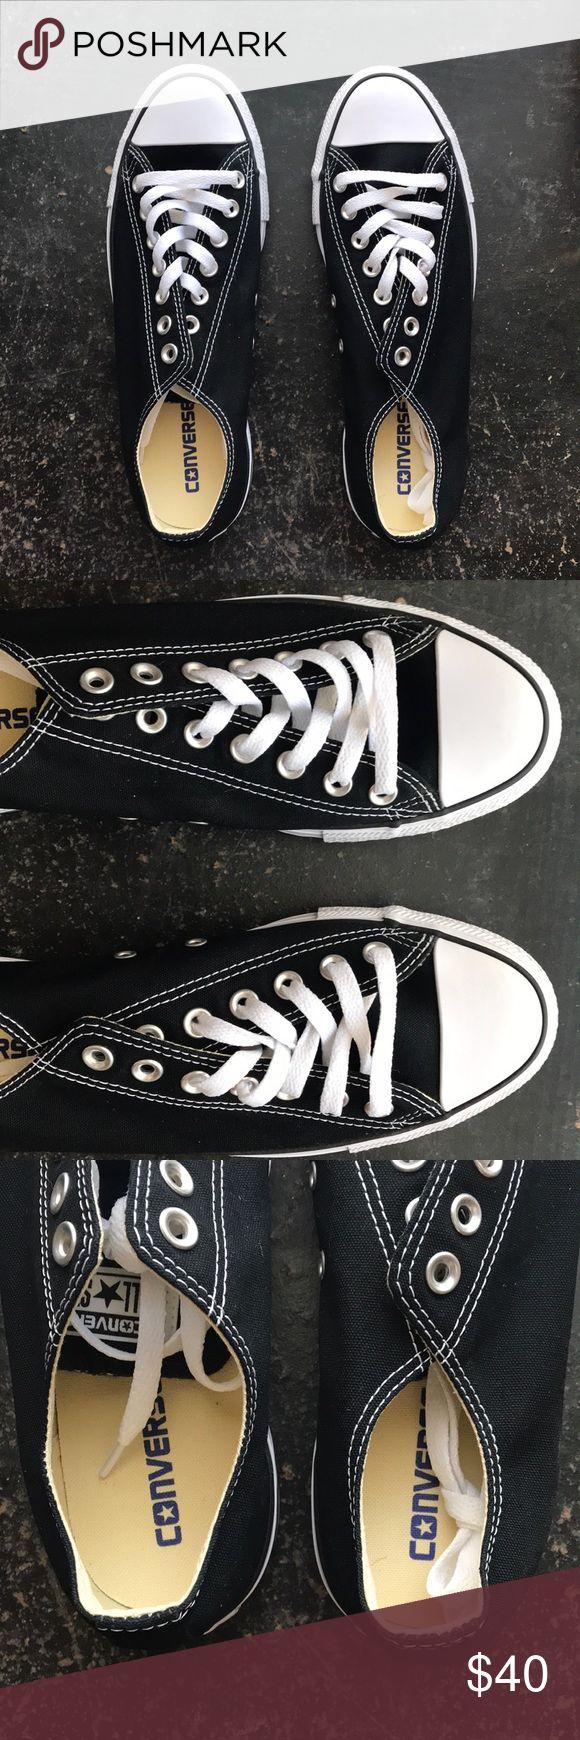 eazy e converse shoes